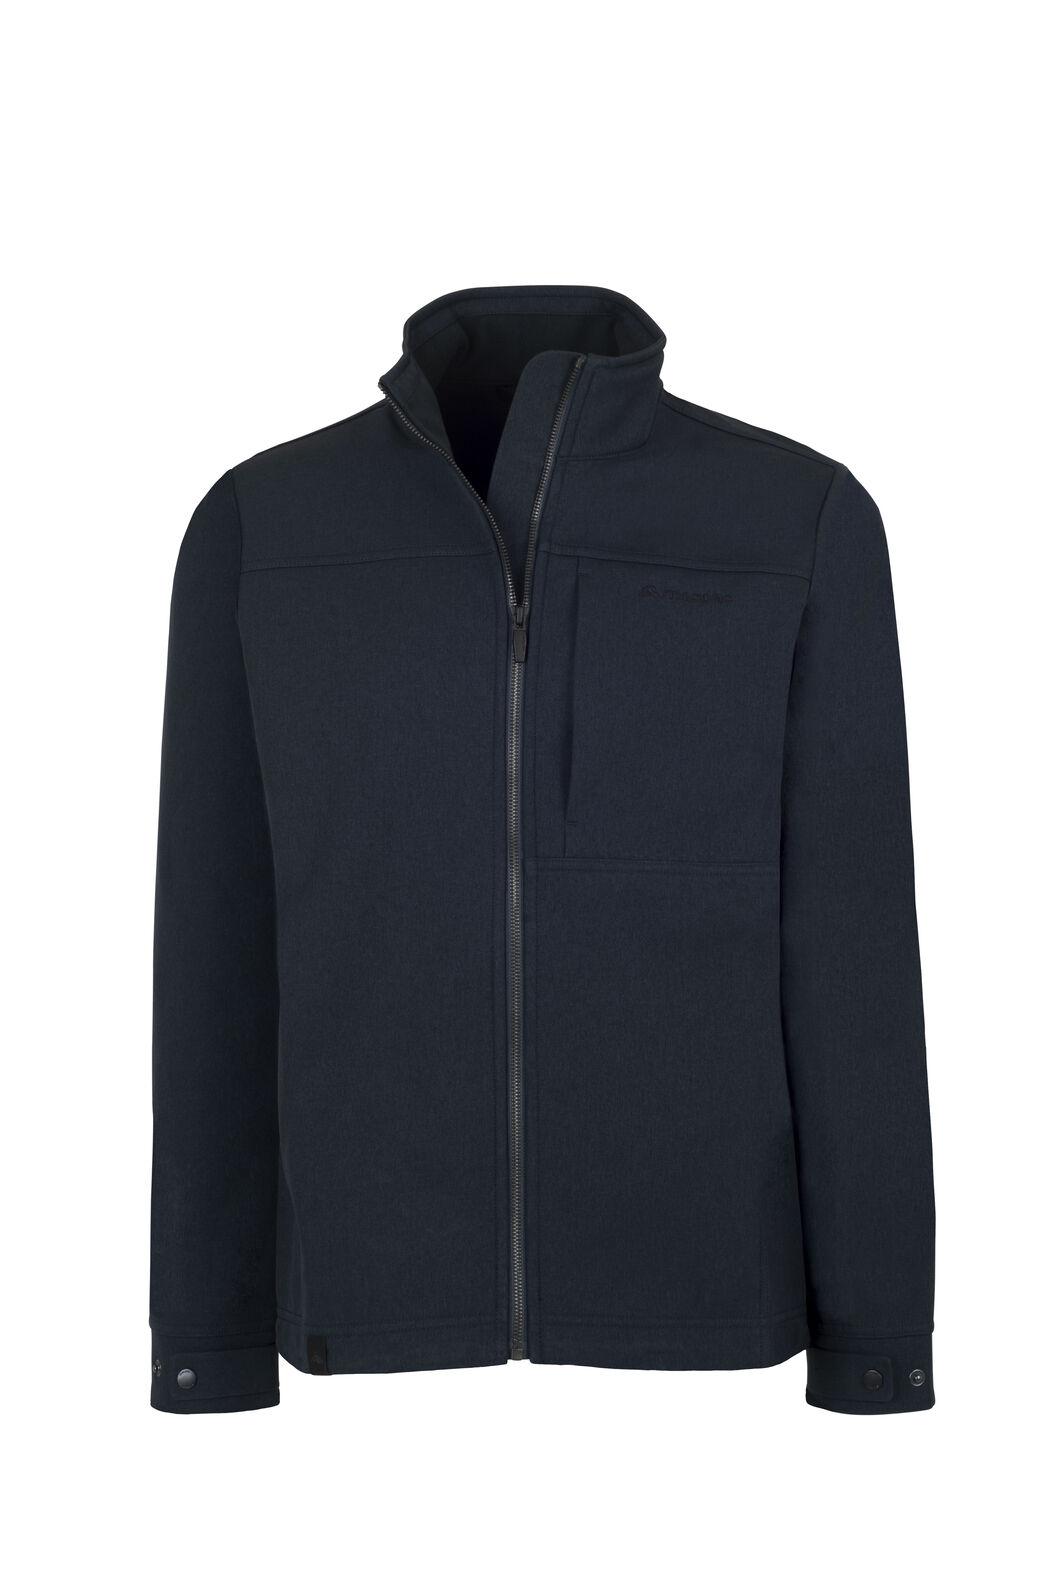 Macpac Chord Softshell Jacket - Men's, Carbon, hi-res